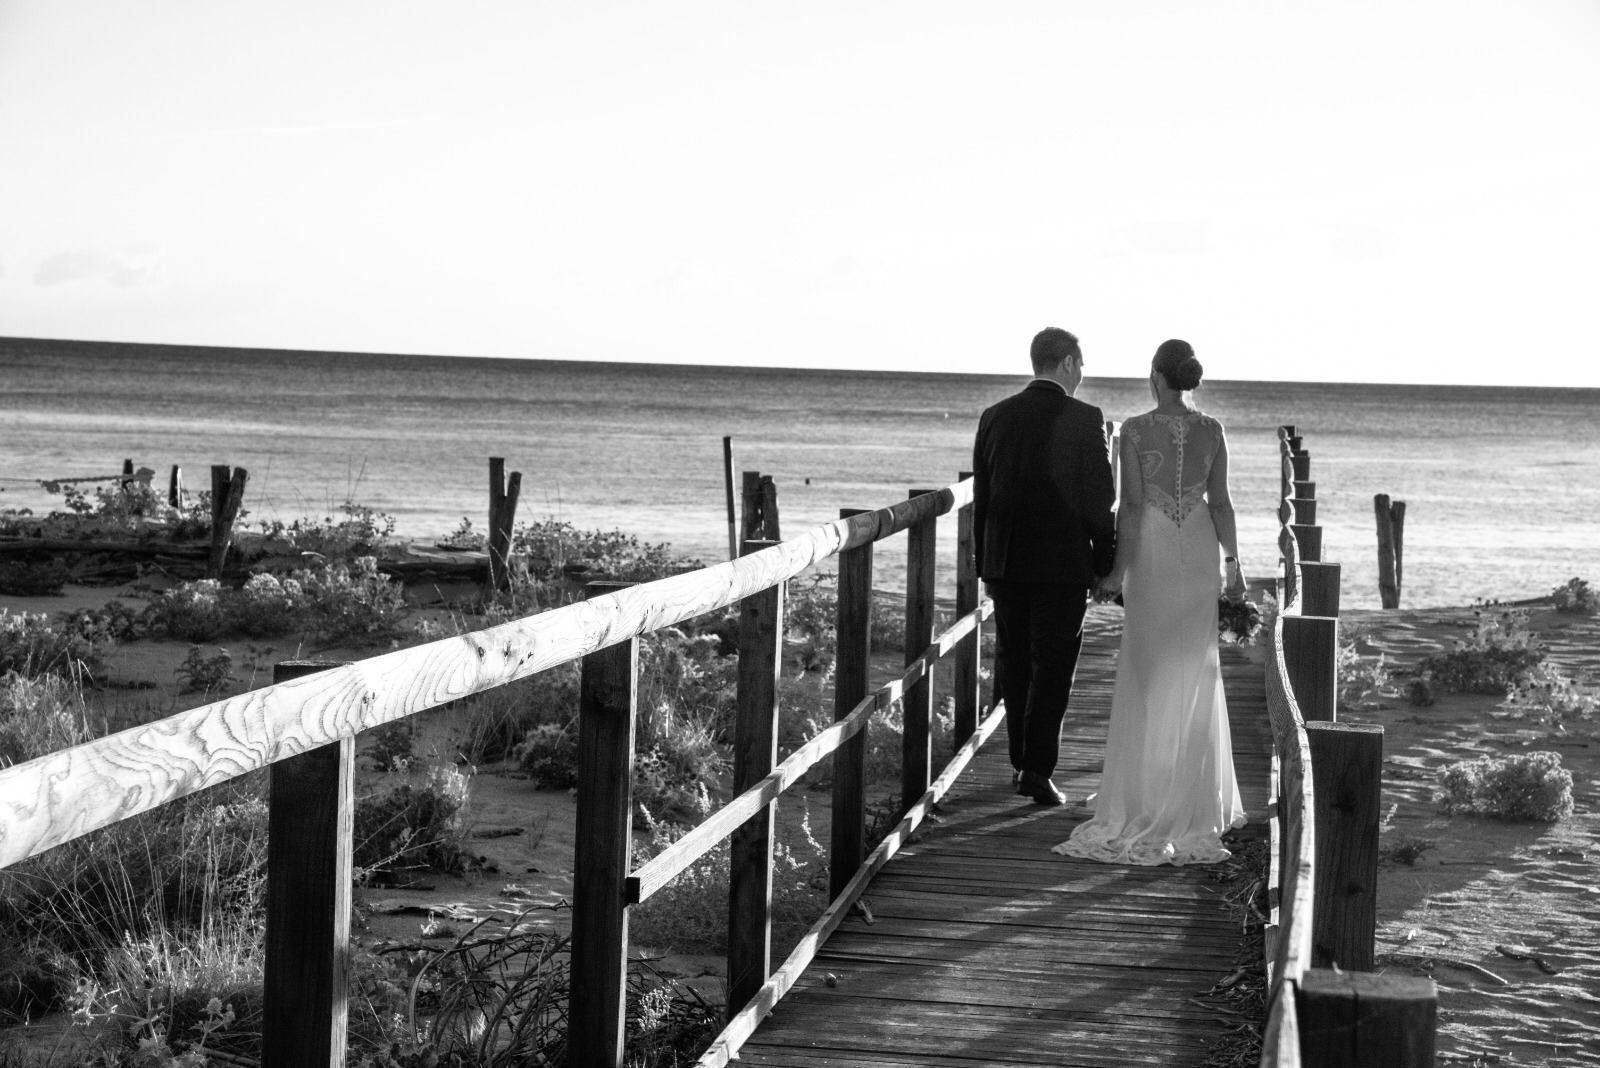 https://www.weddingamalfi.com/wp-content/uploads/Simona-Pietro-wedding-in-Palinuro-Wedding-Amalfi-wedding-planner.jpeg